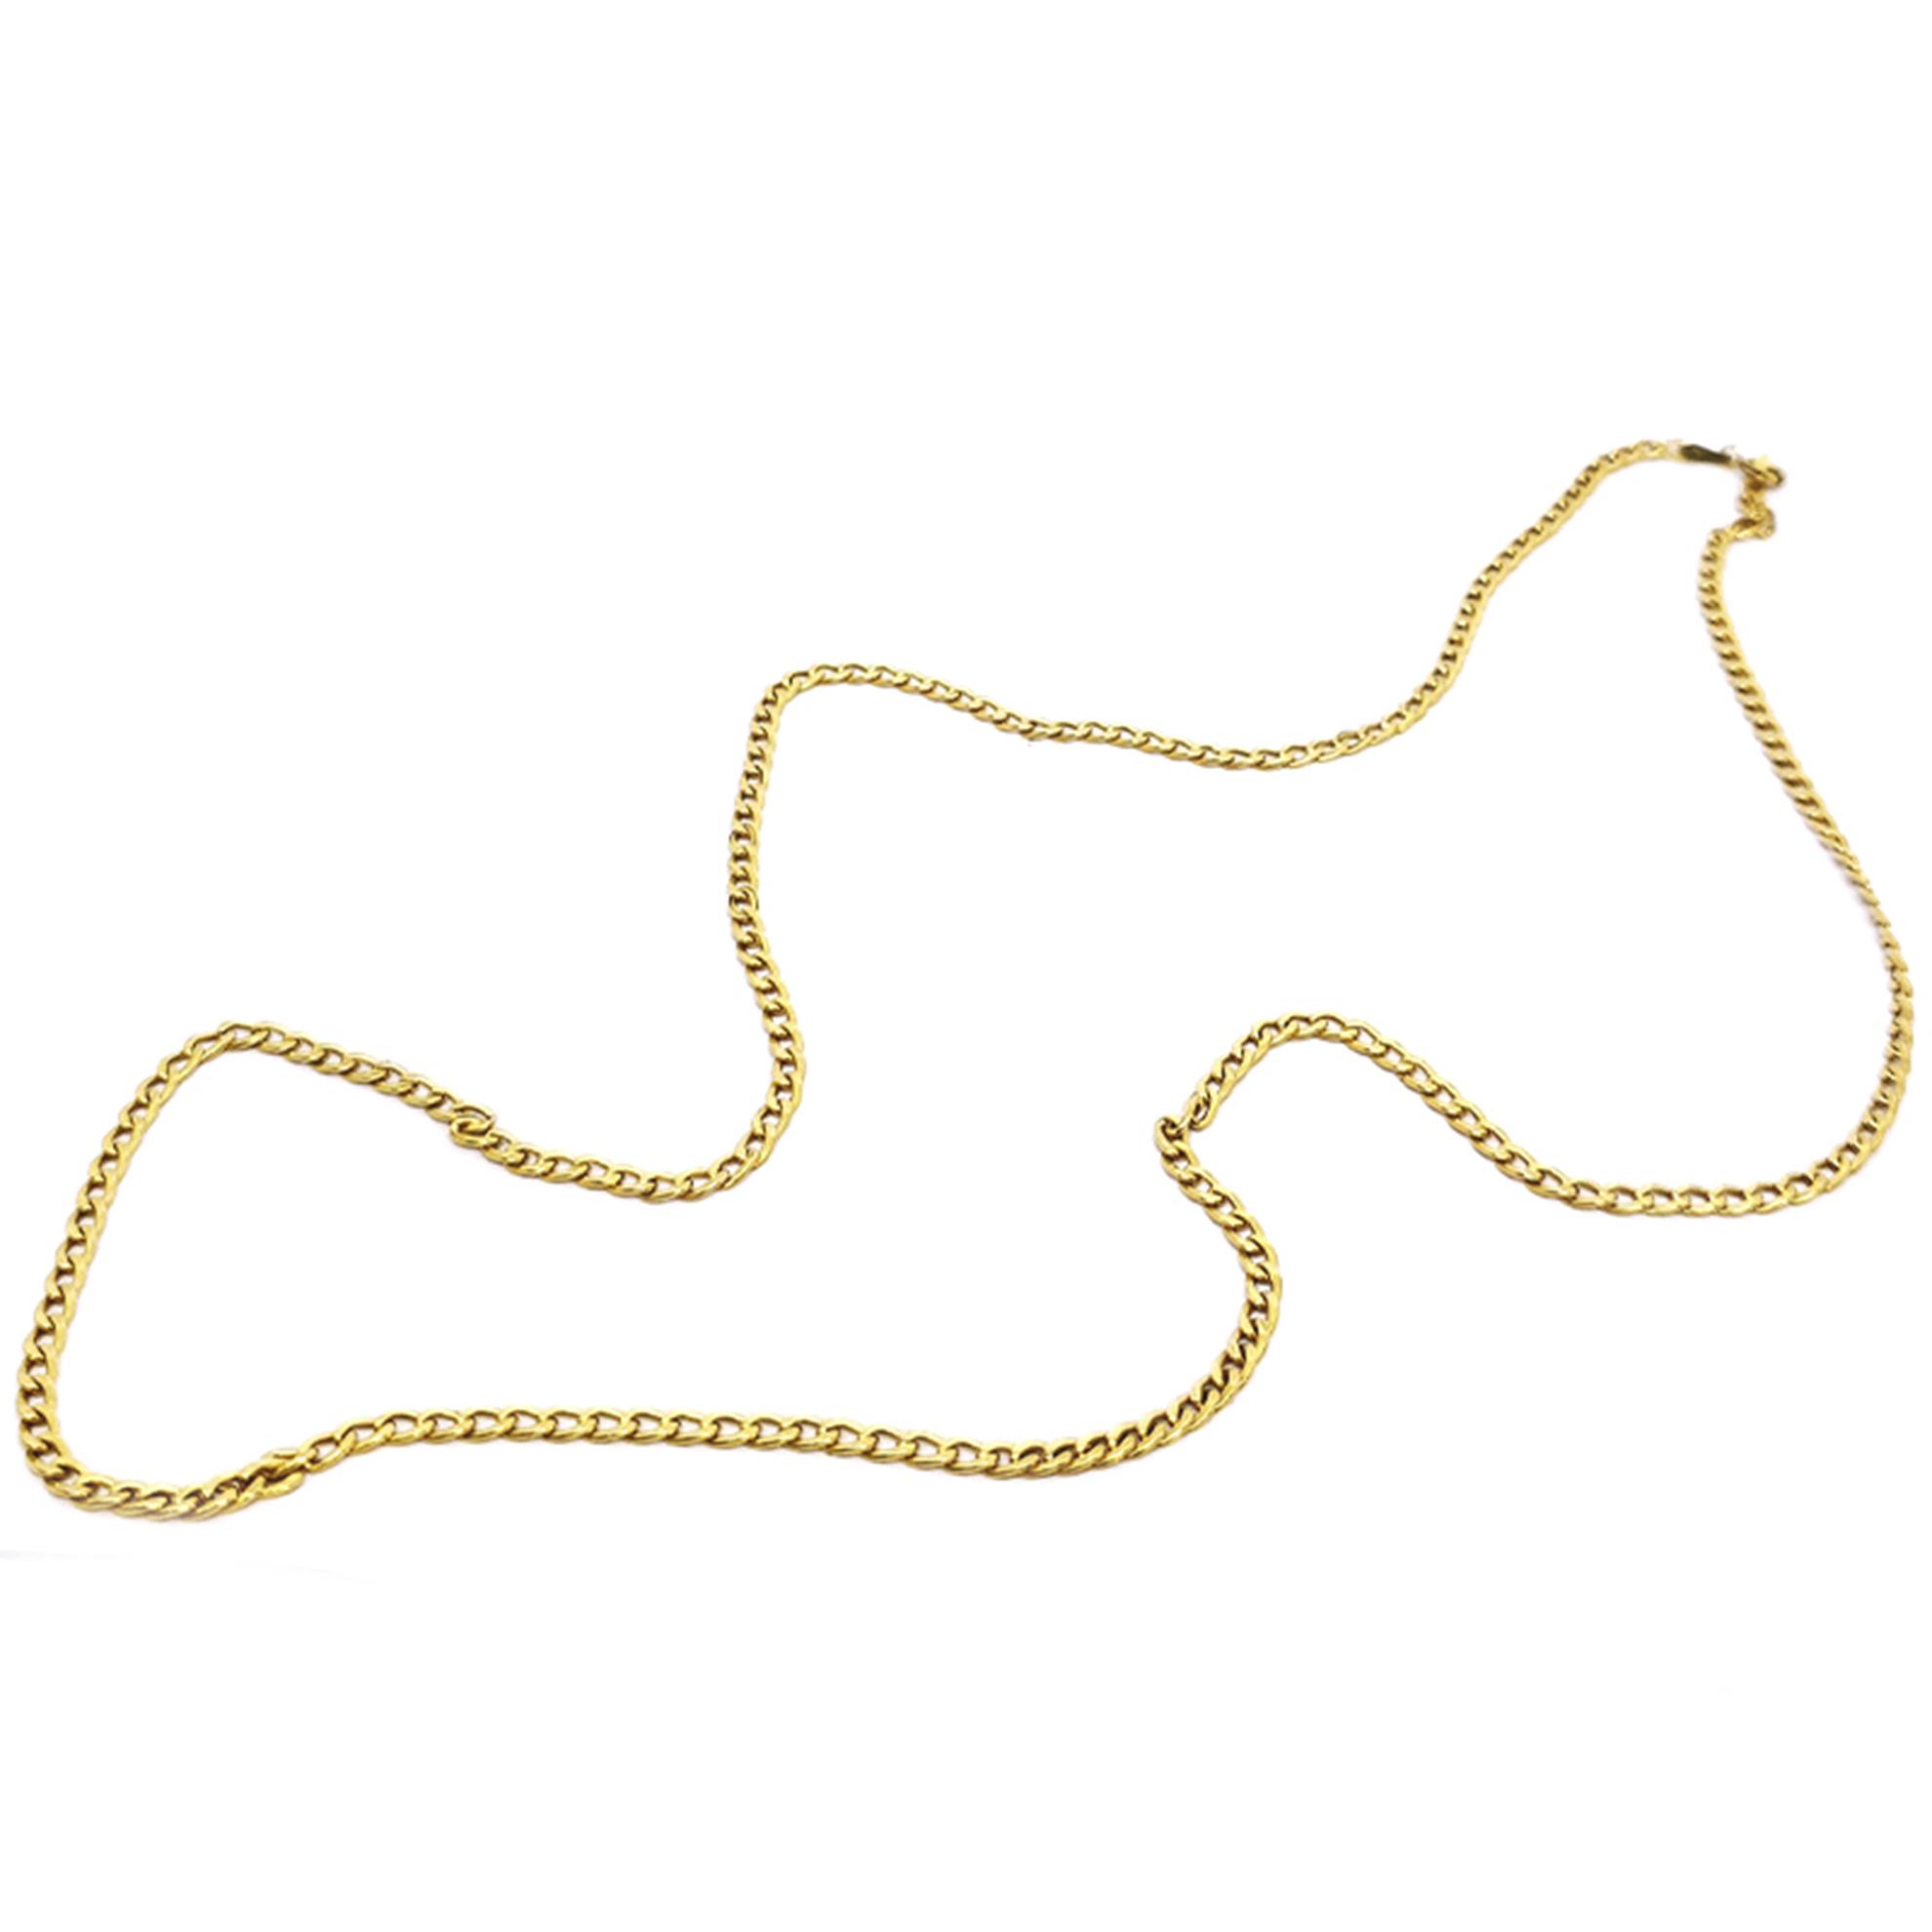 Colar Grumet em Ouro 18 Kilates